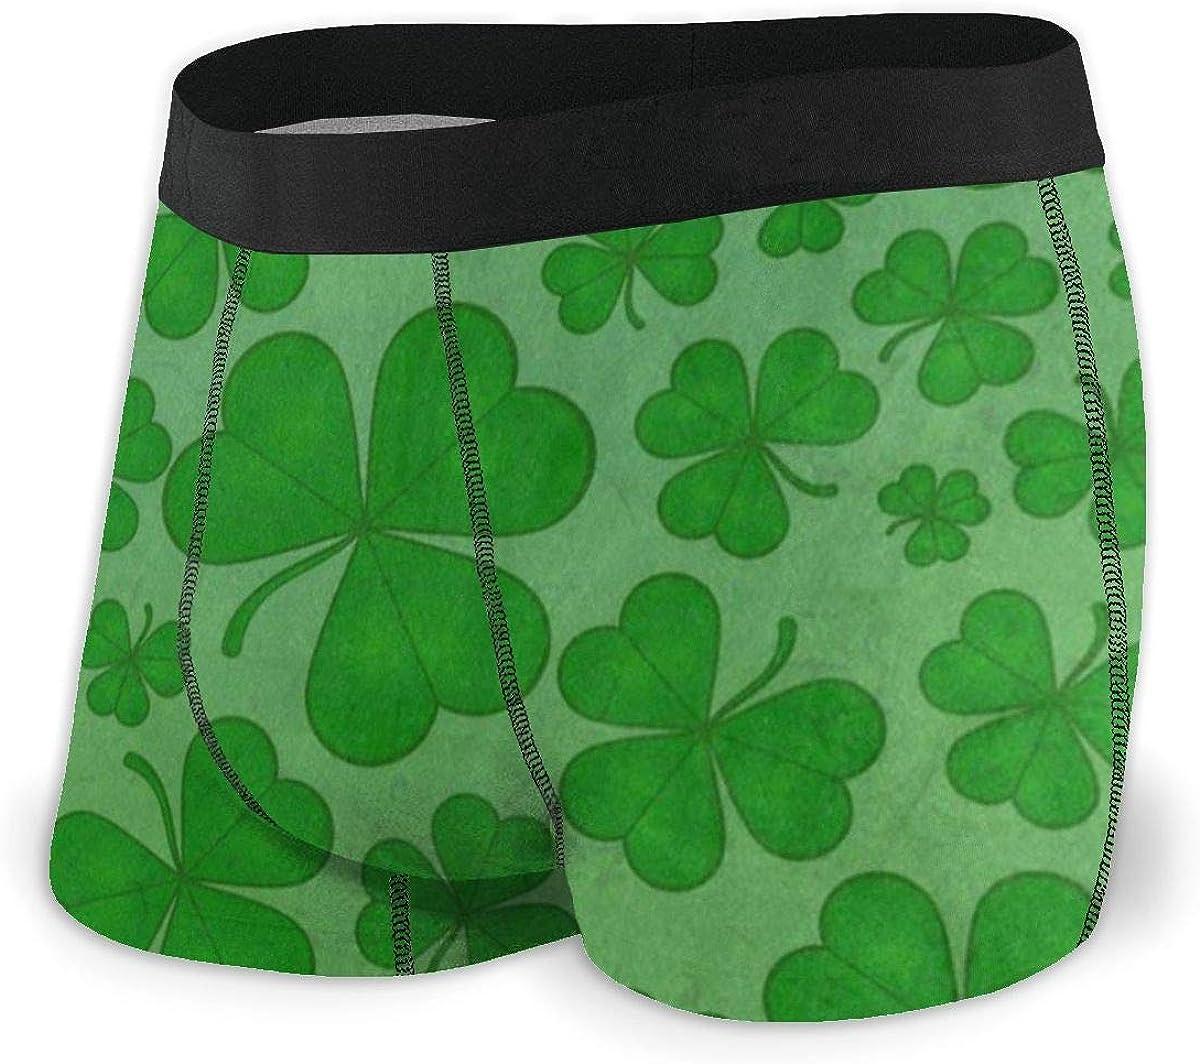 Mens Boxer Briefs St. Patrick's Day Green Clover Breathable Underwear